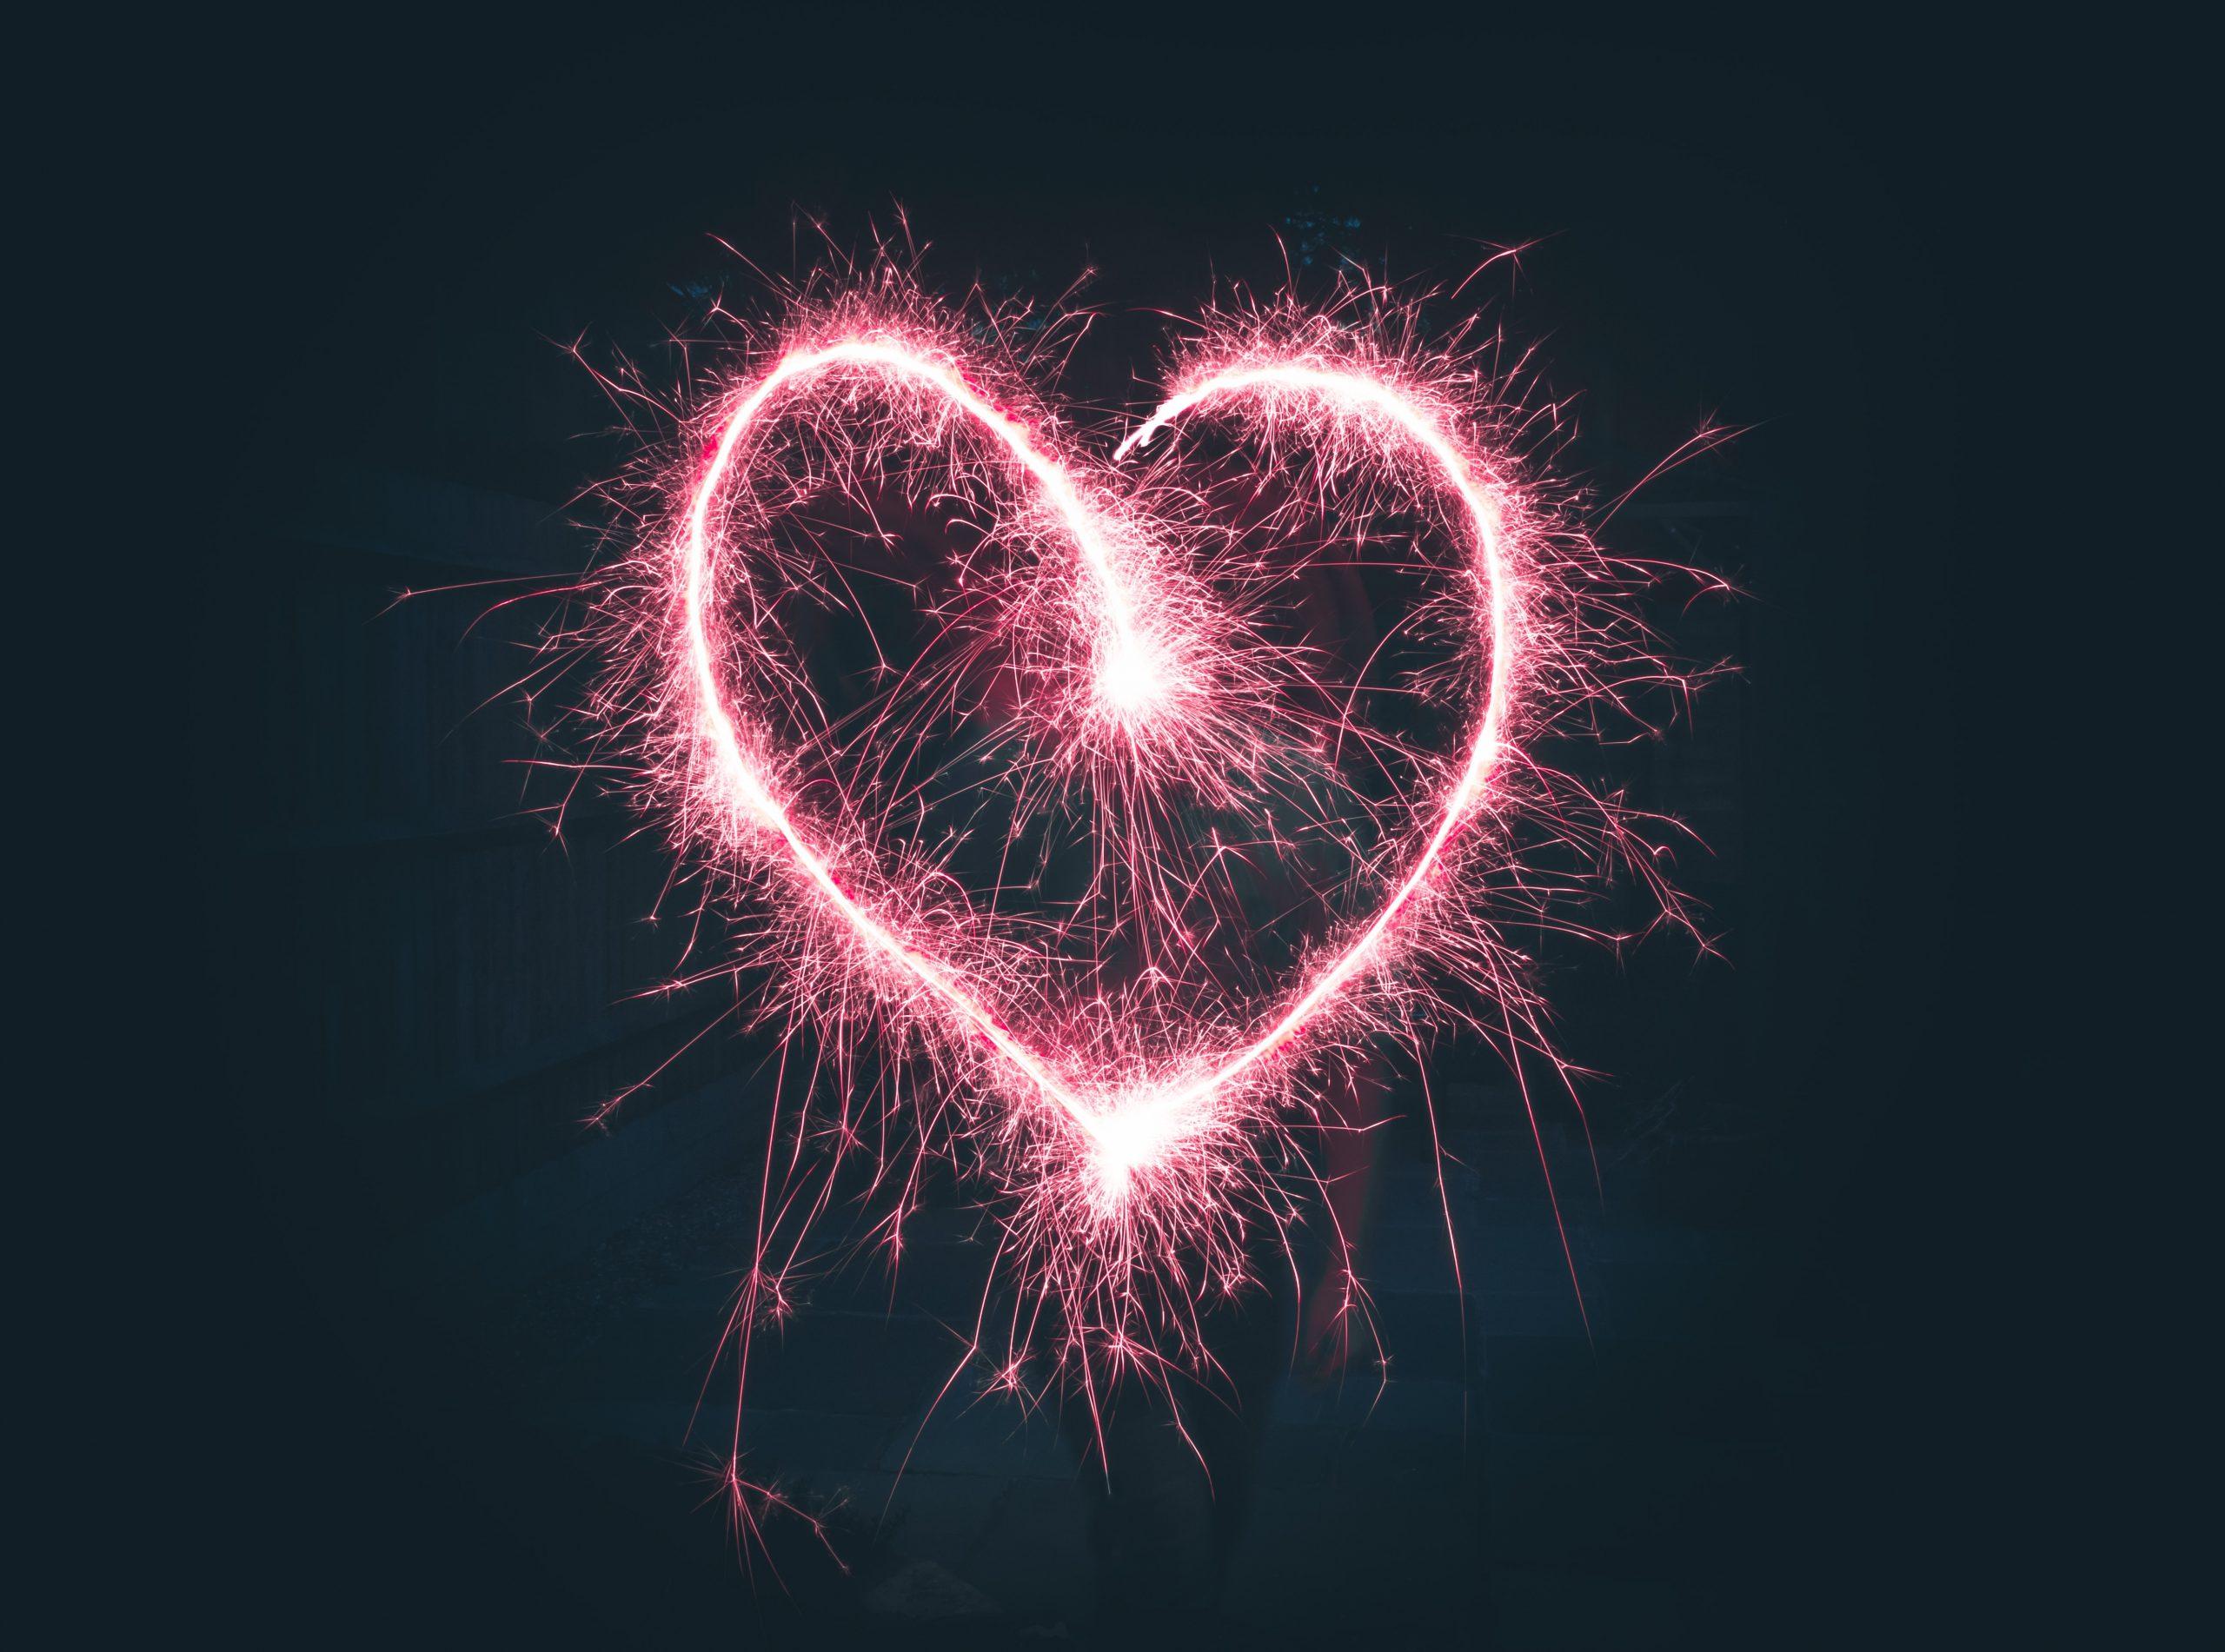 wallpaper Heart shaped pink sparklers